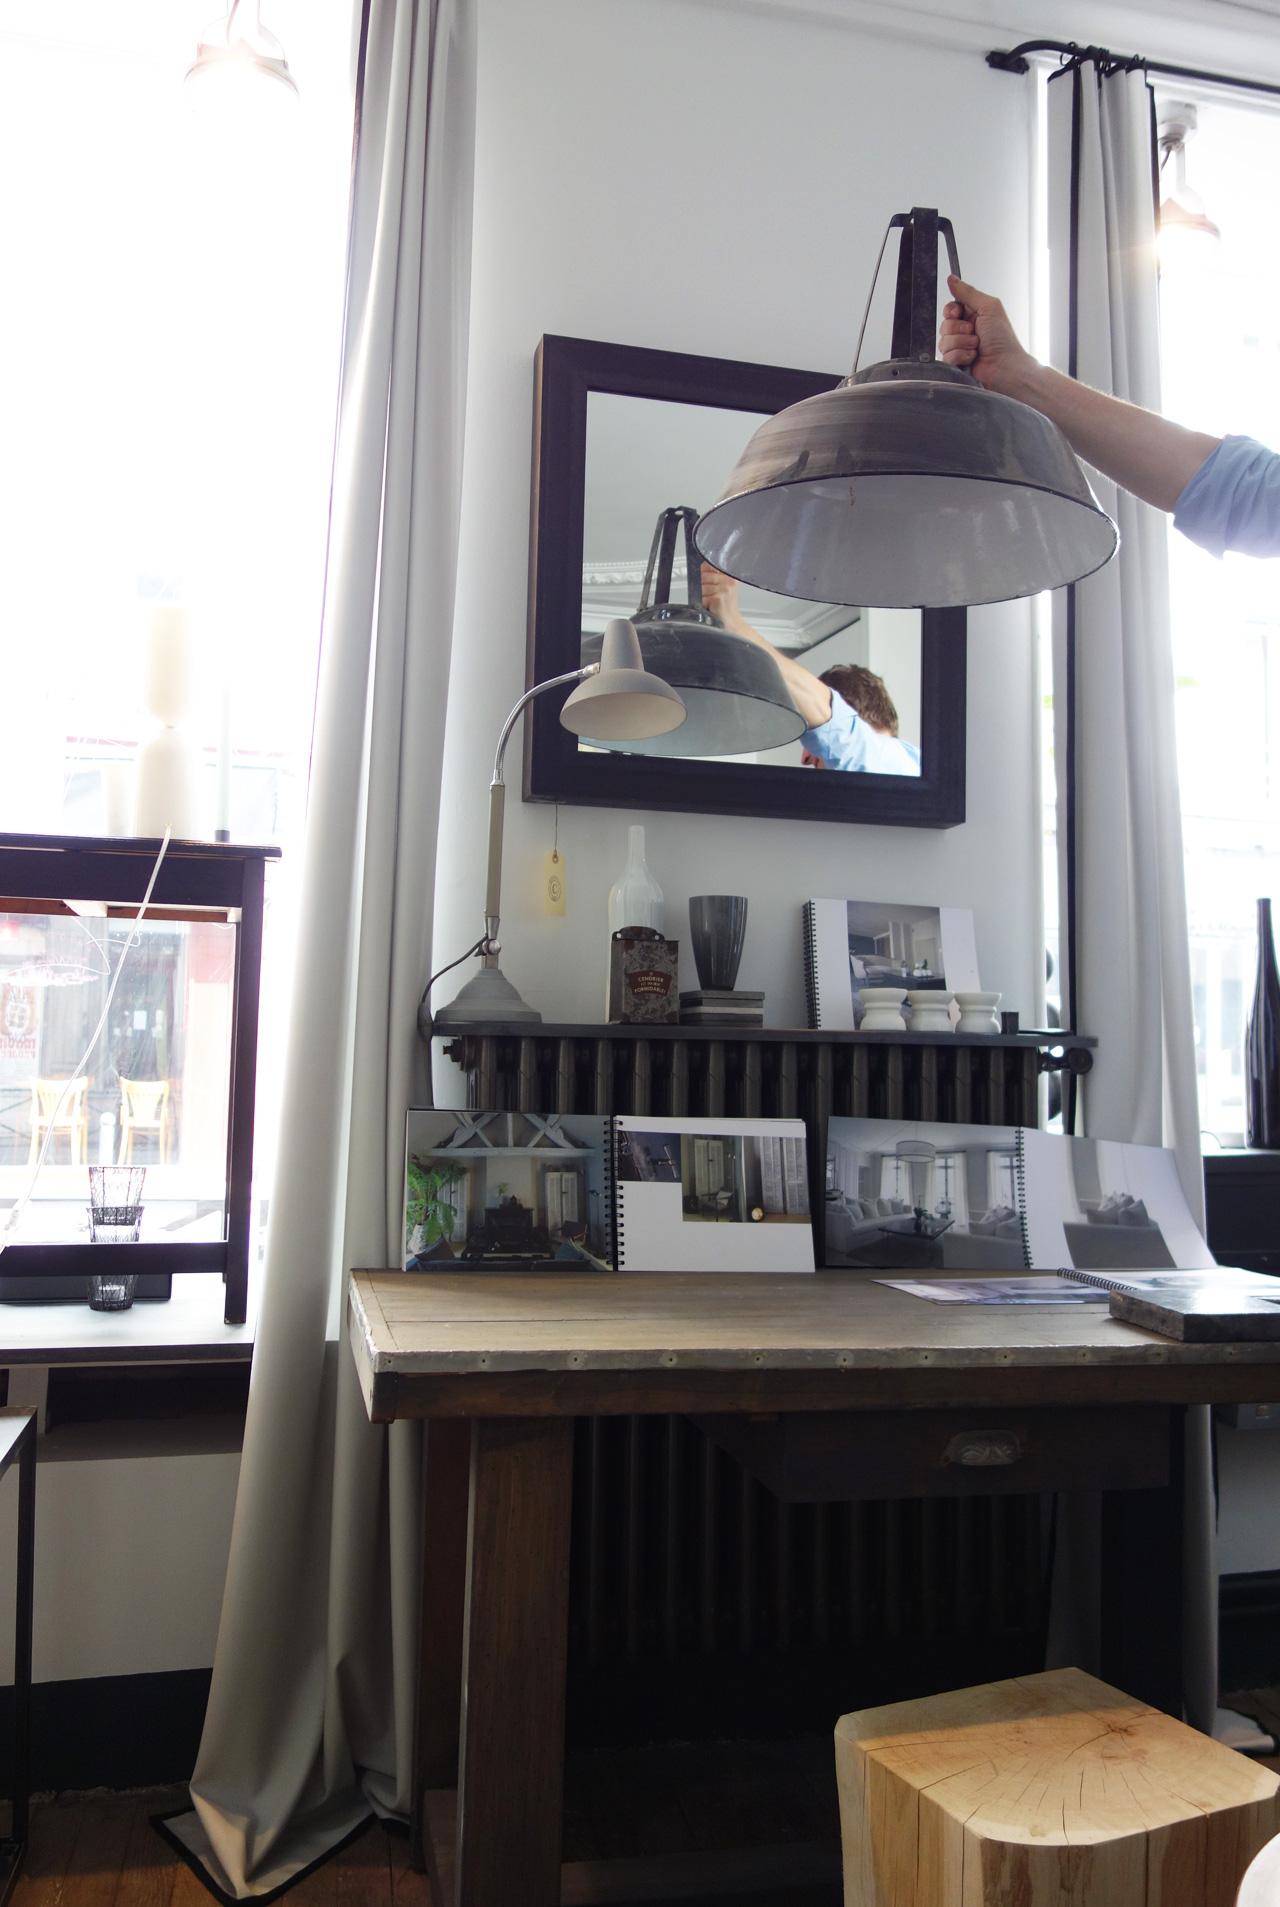 David-Gaillard-Les-Curieuses-deco-table-lampe